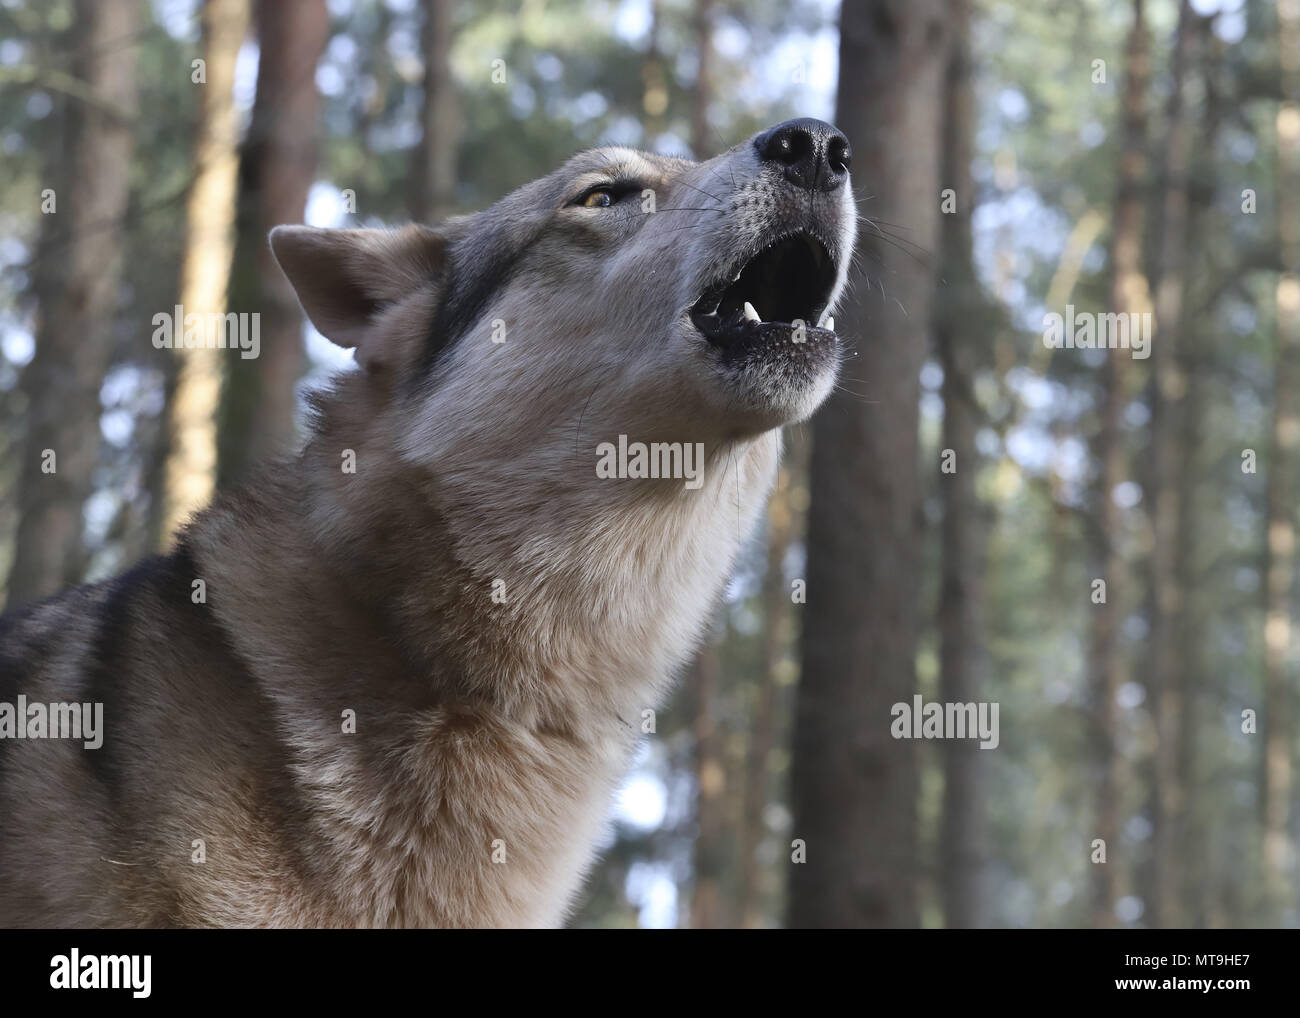 Czechoslovakian Wolfdog. Portrait of adult dog, howling. Germany - Stock Image